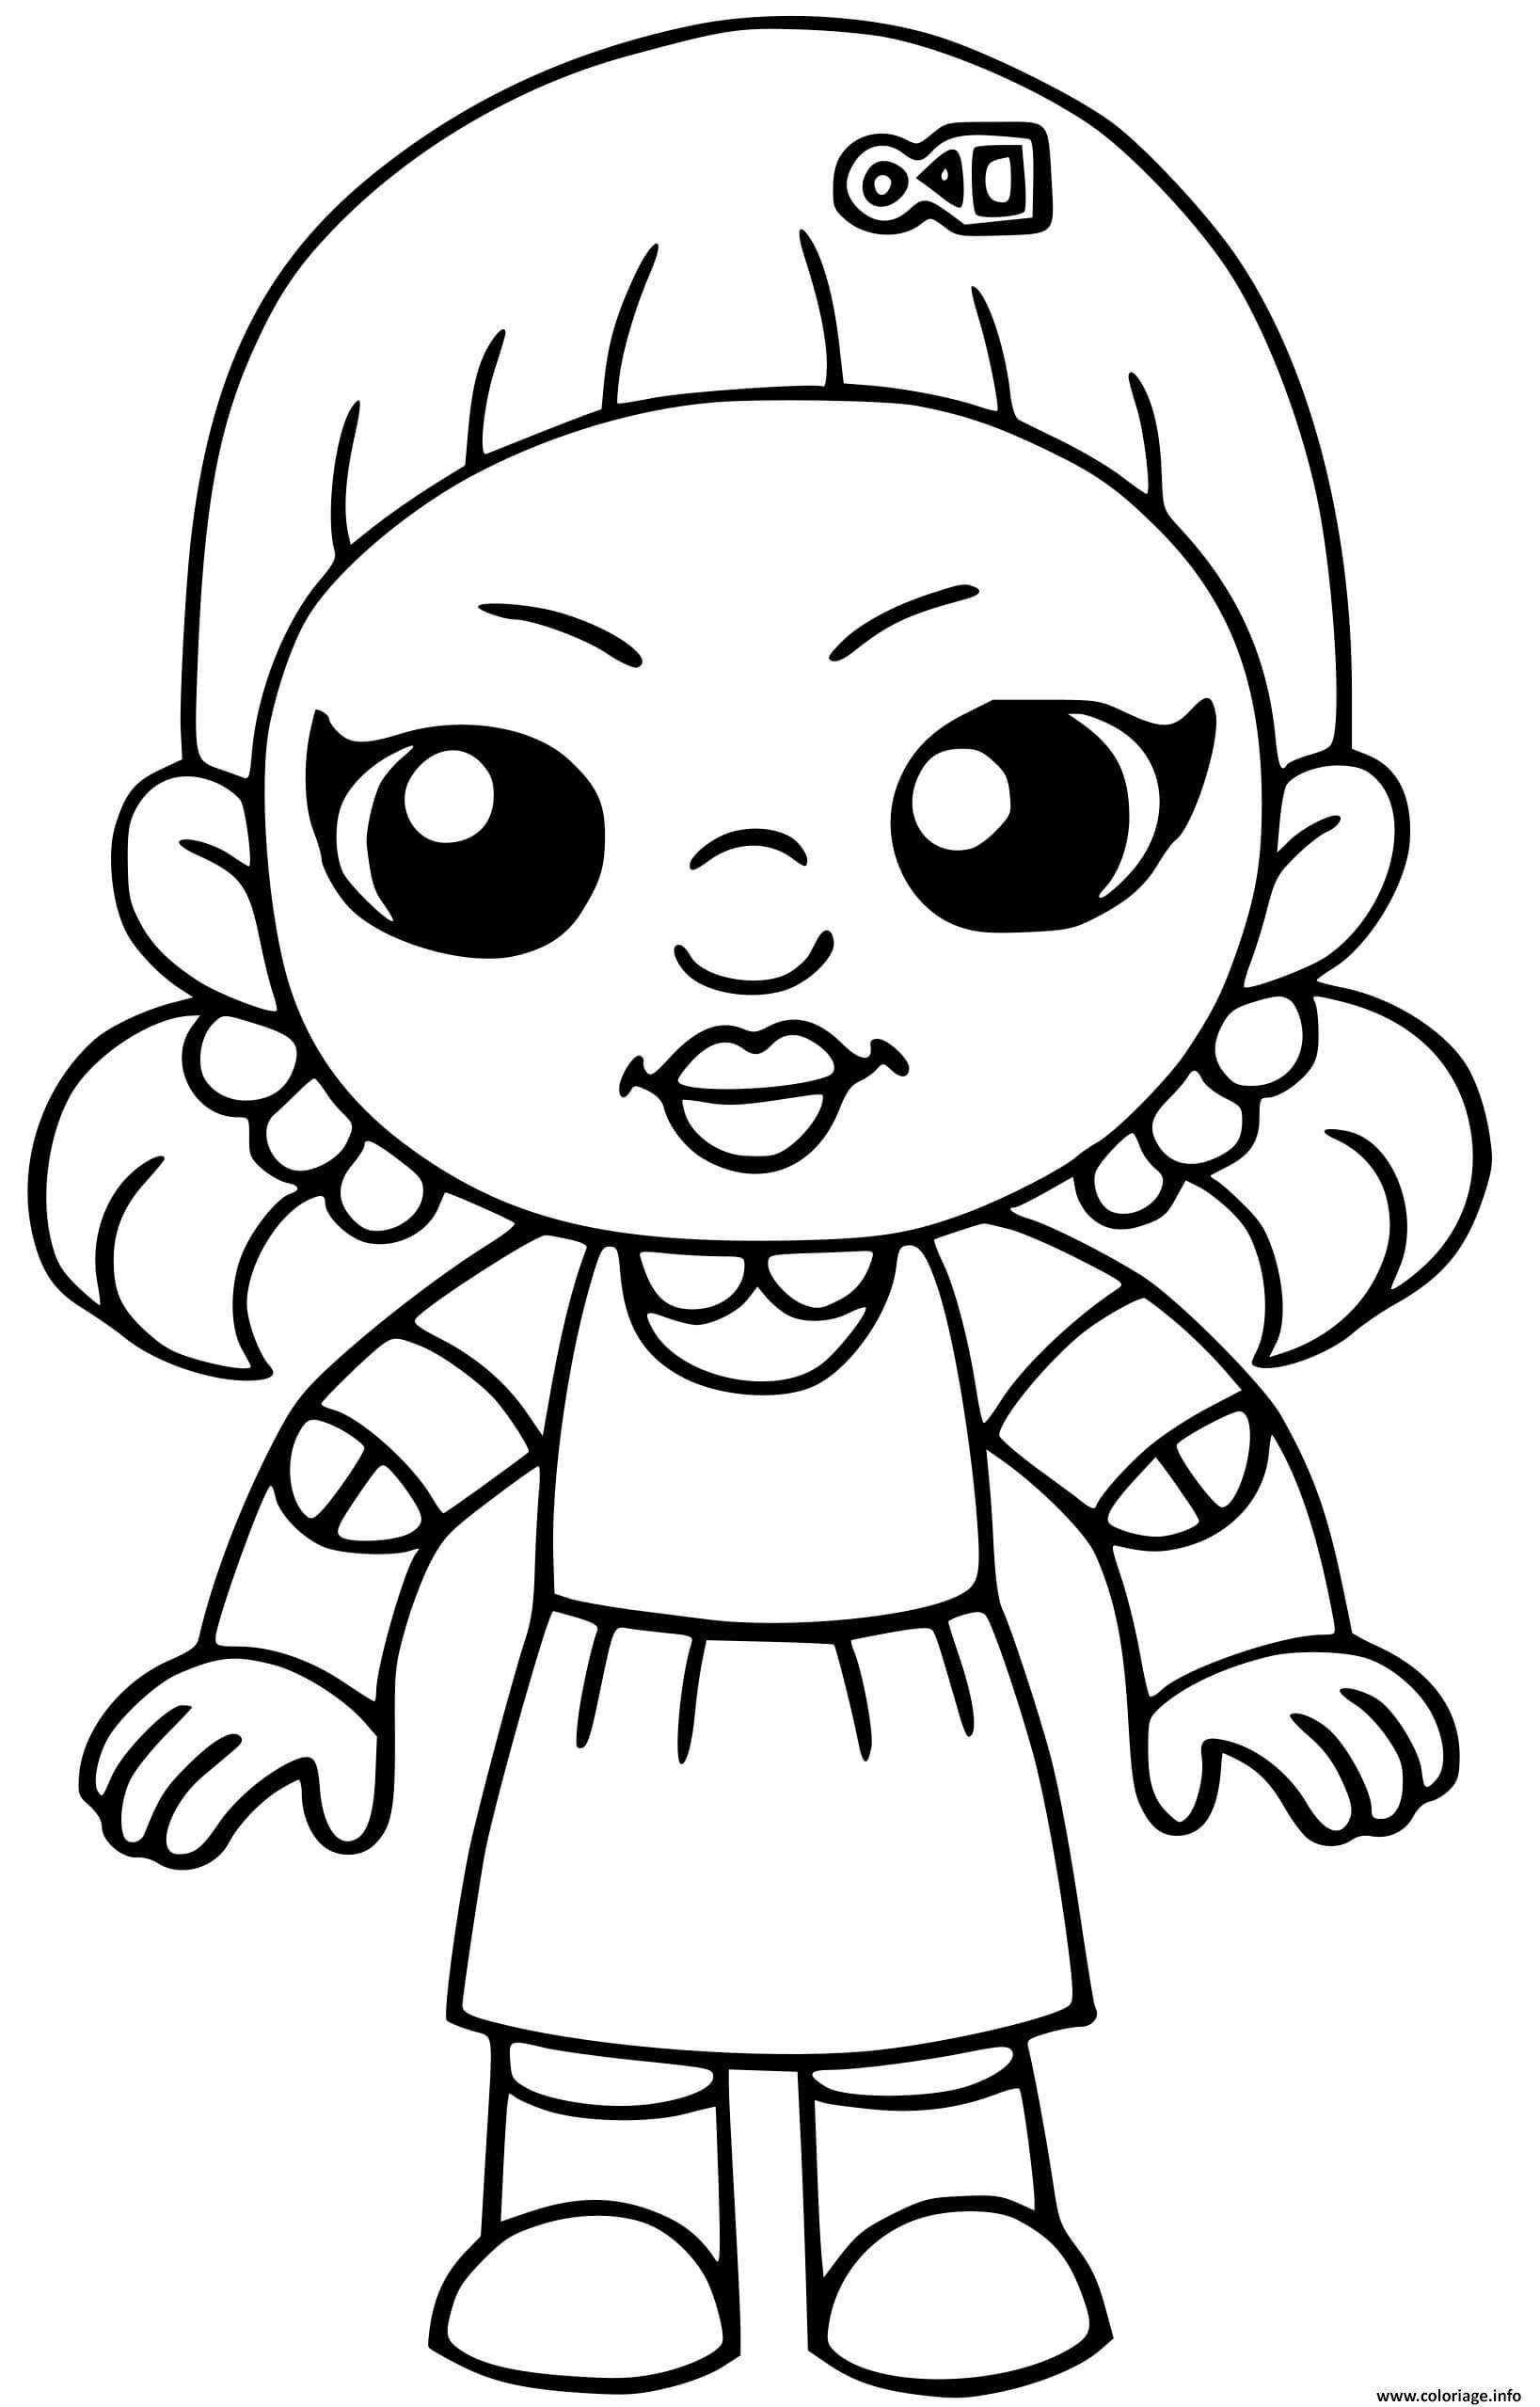 Dessin squid game doll red light green light Coloriage Gratuit à Imprimer